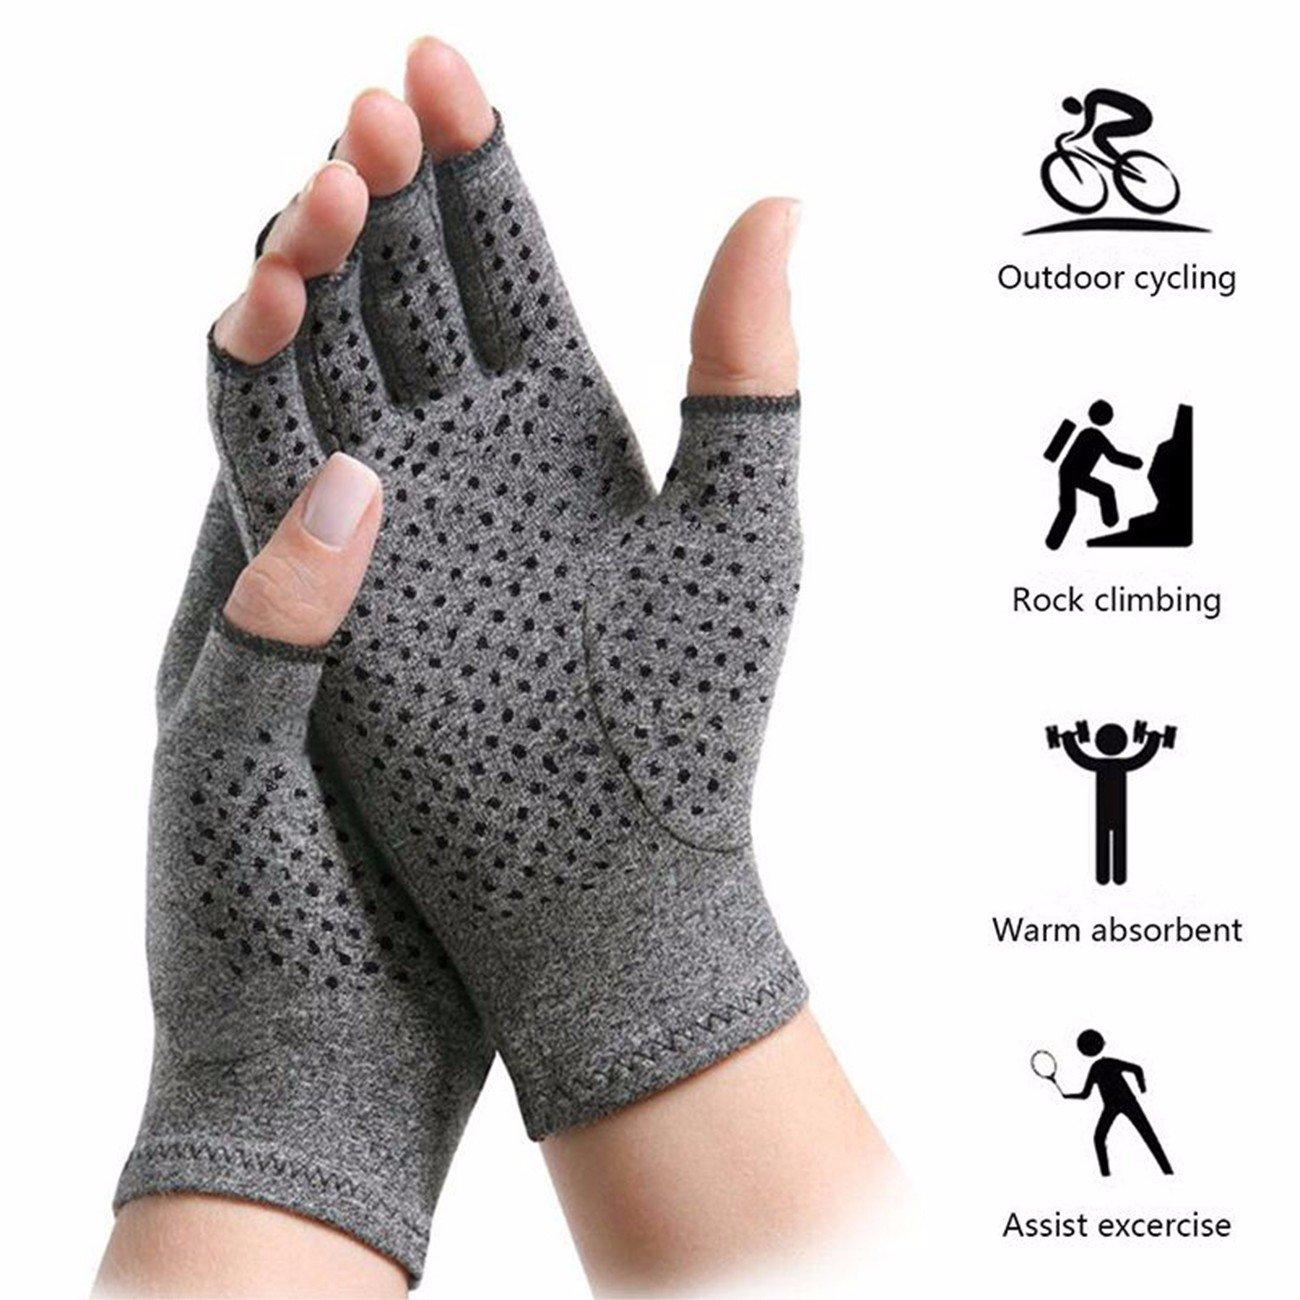 KIWI RATA Non-Slip Arthritis Gloves, Cotton & Spandex Arthritis Rehabilitation Bumps Training Nursing Grip Gloves Open Finger Keep Hands Warm & Relieves Pain for Men & Women